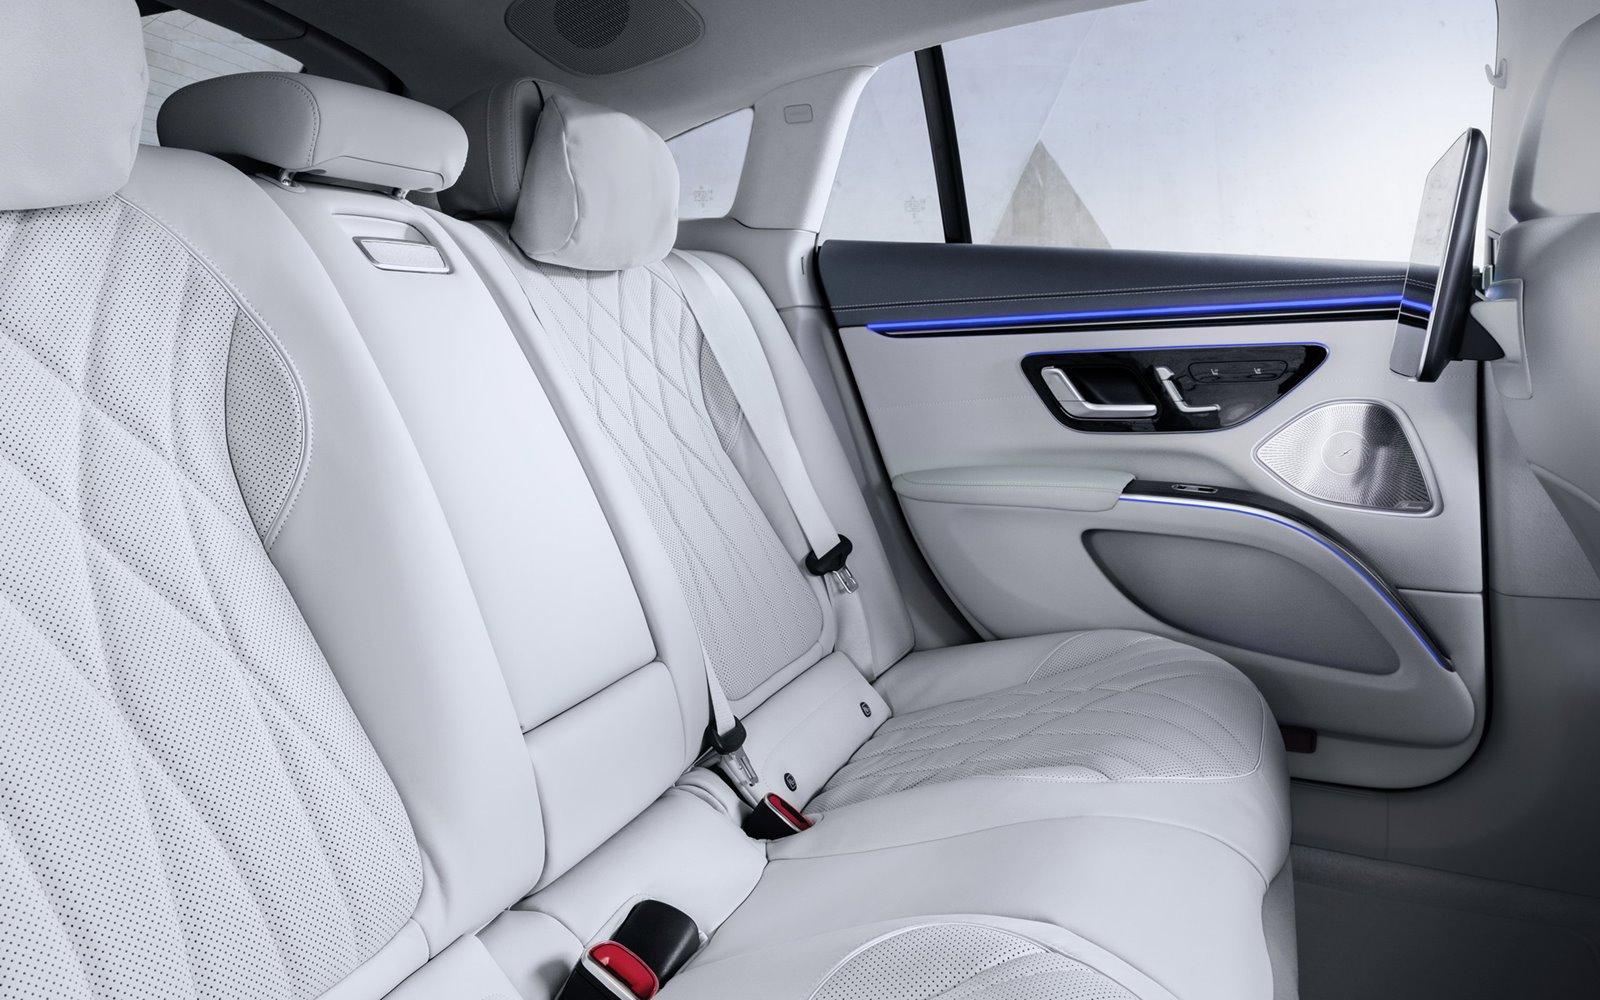 Mercedes EQS interior blanco plazas traseras